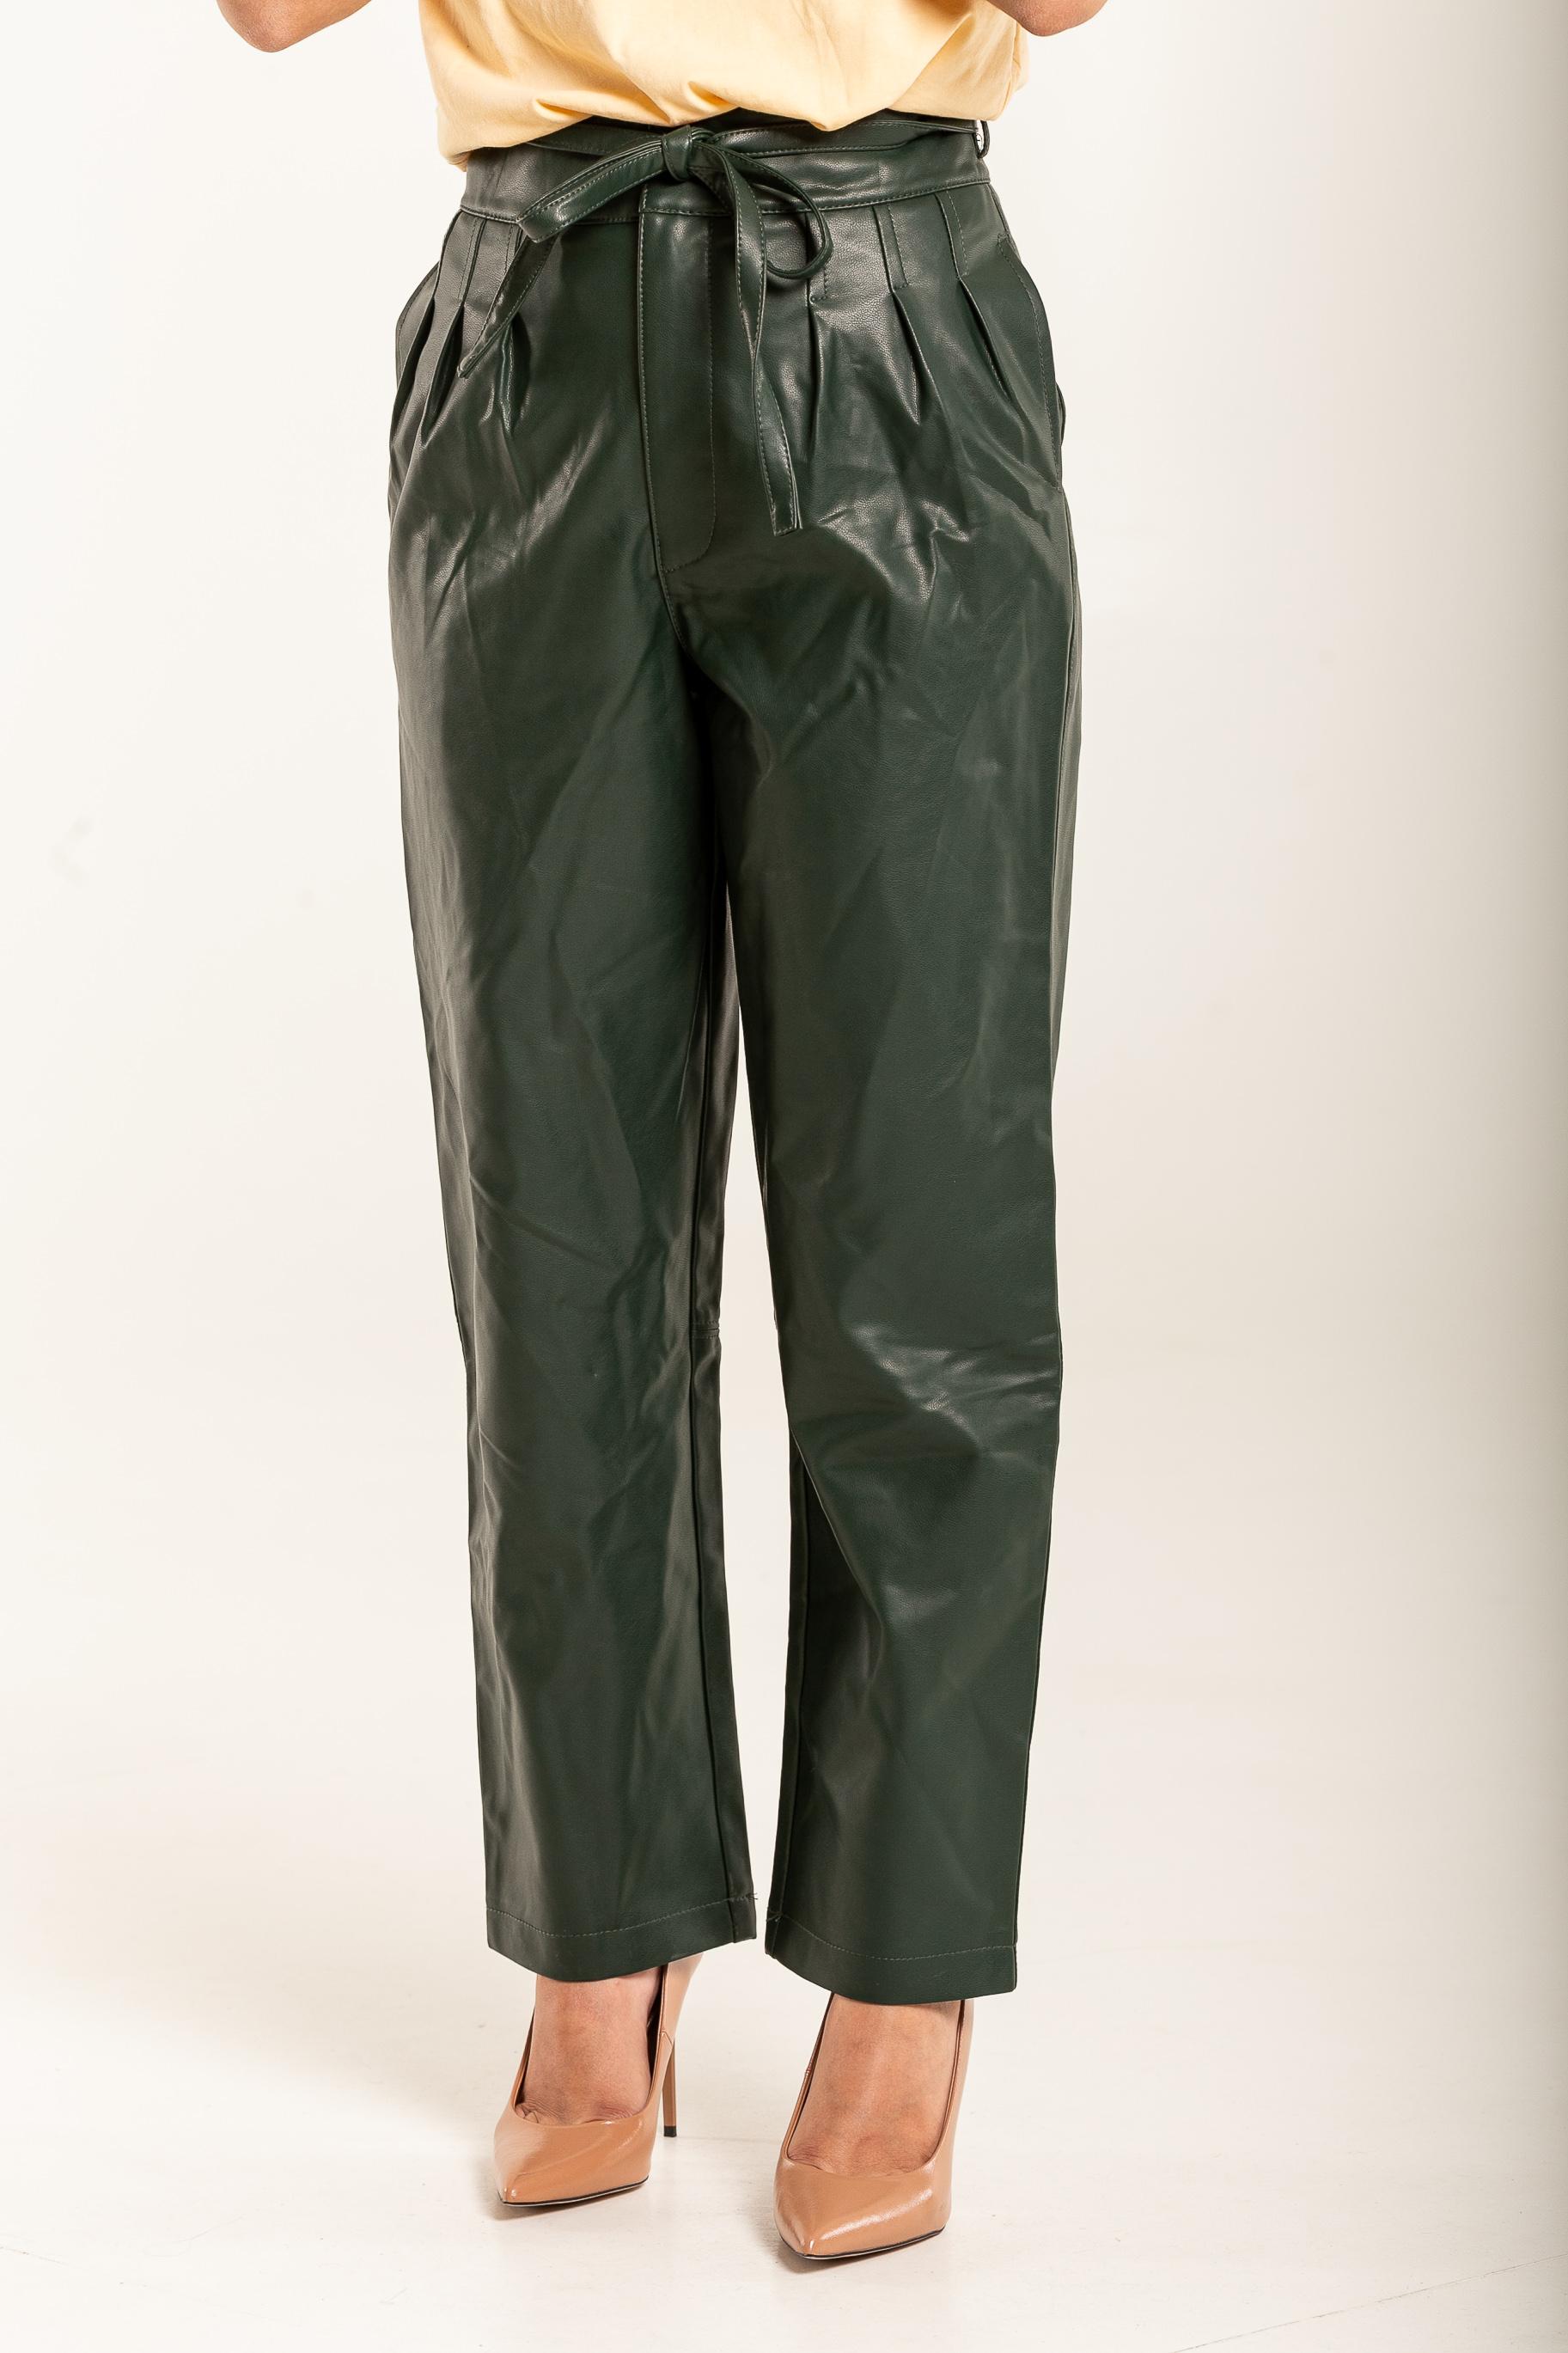 Pantaloni ONLY Casual (3369) photo